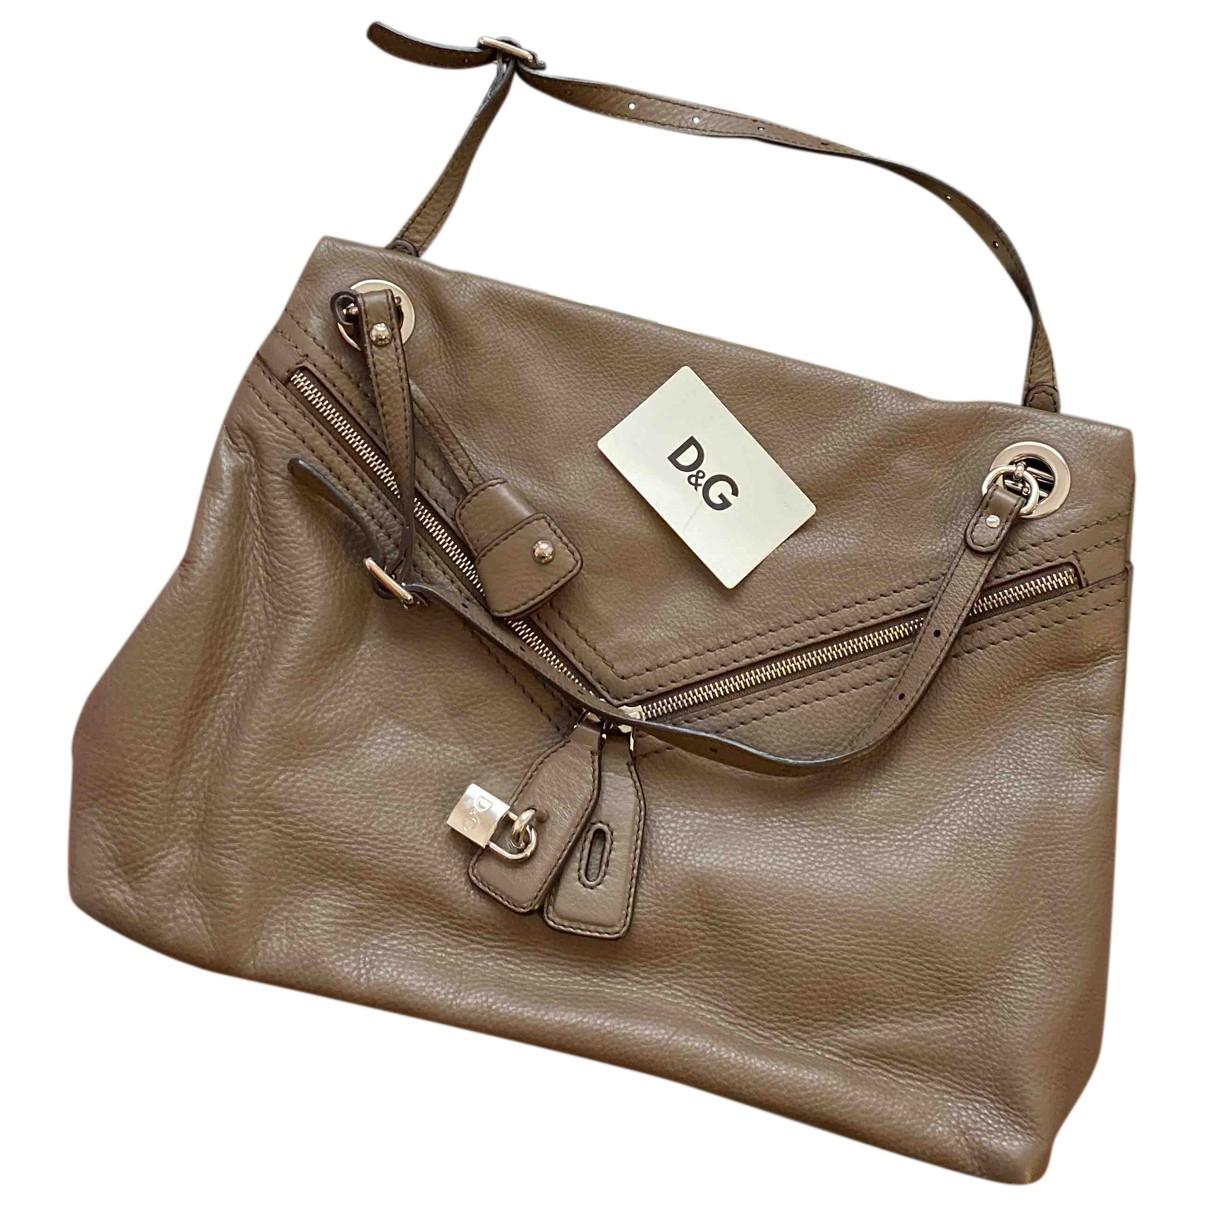 D&g N Khaki Fur handbag for Women N